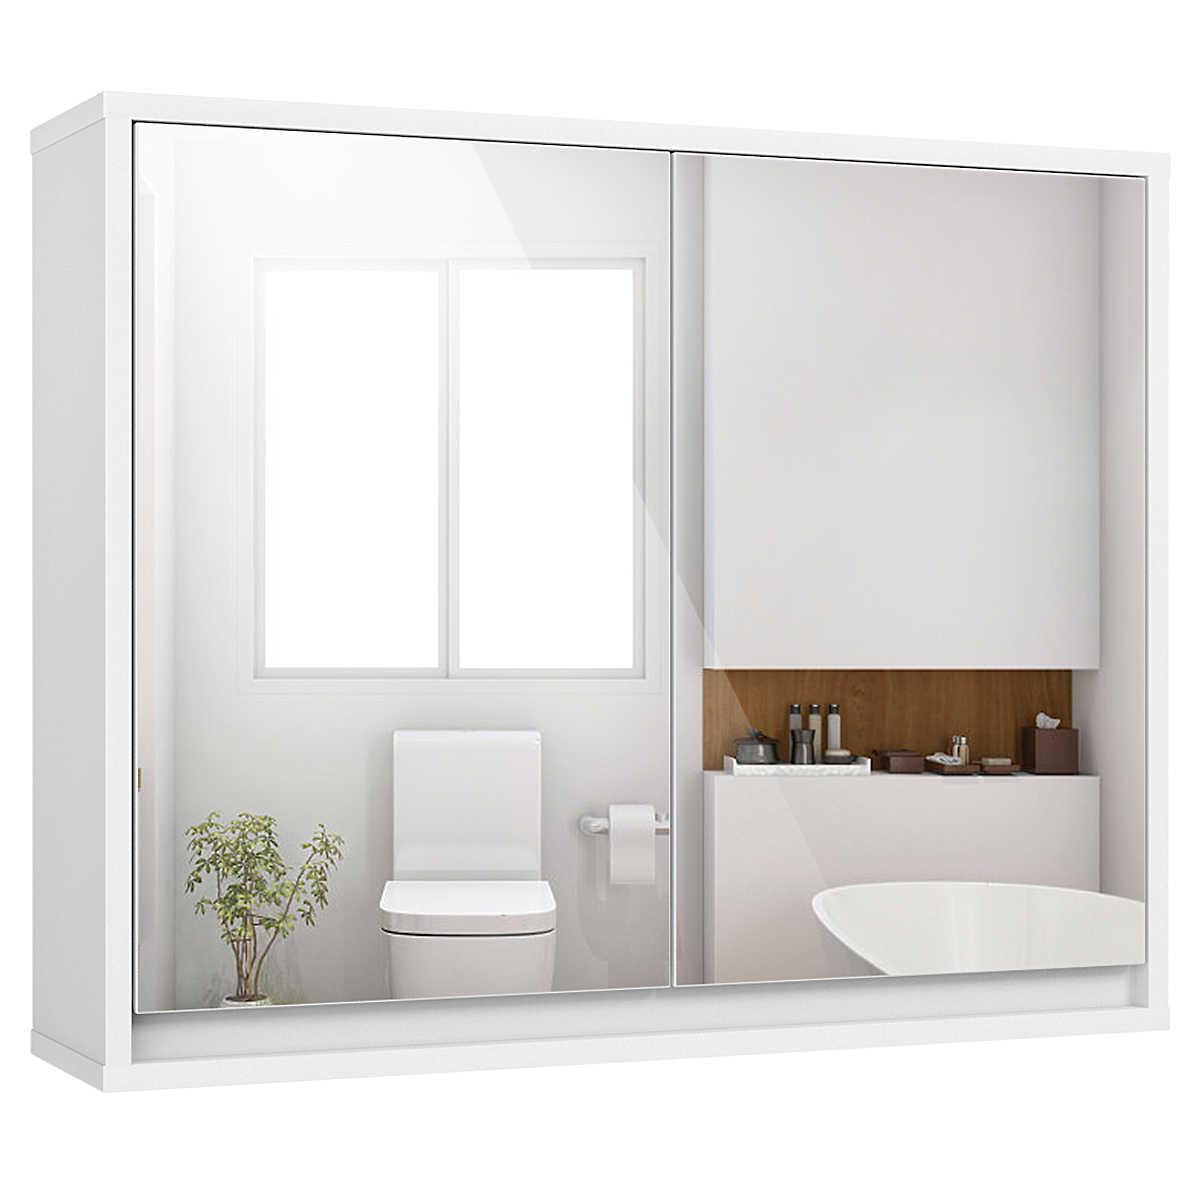 Bathroom Cabinet Single Mirror Door Wall Mount Storage Shelf Organizer Tb Sale Aliexpress